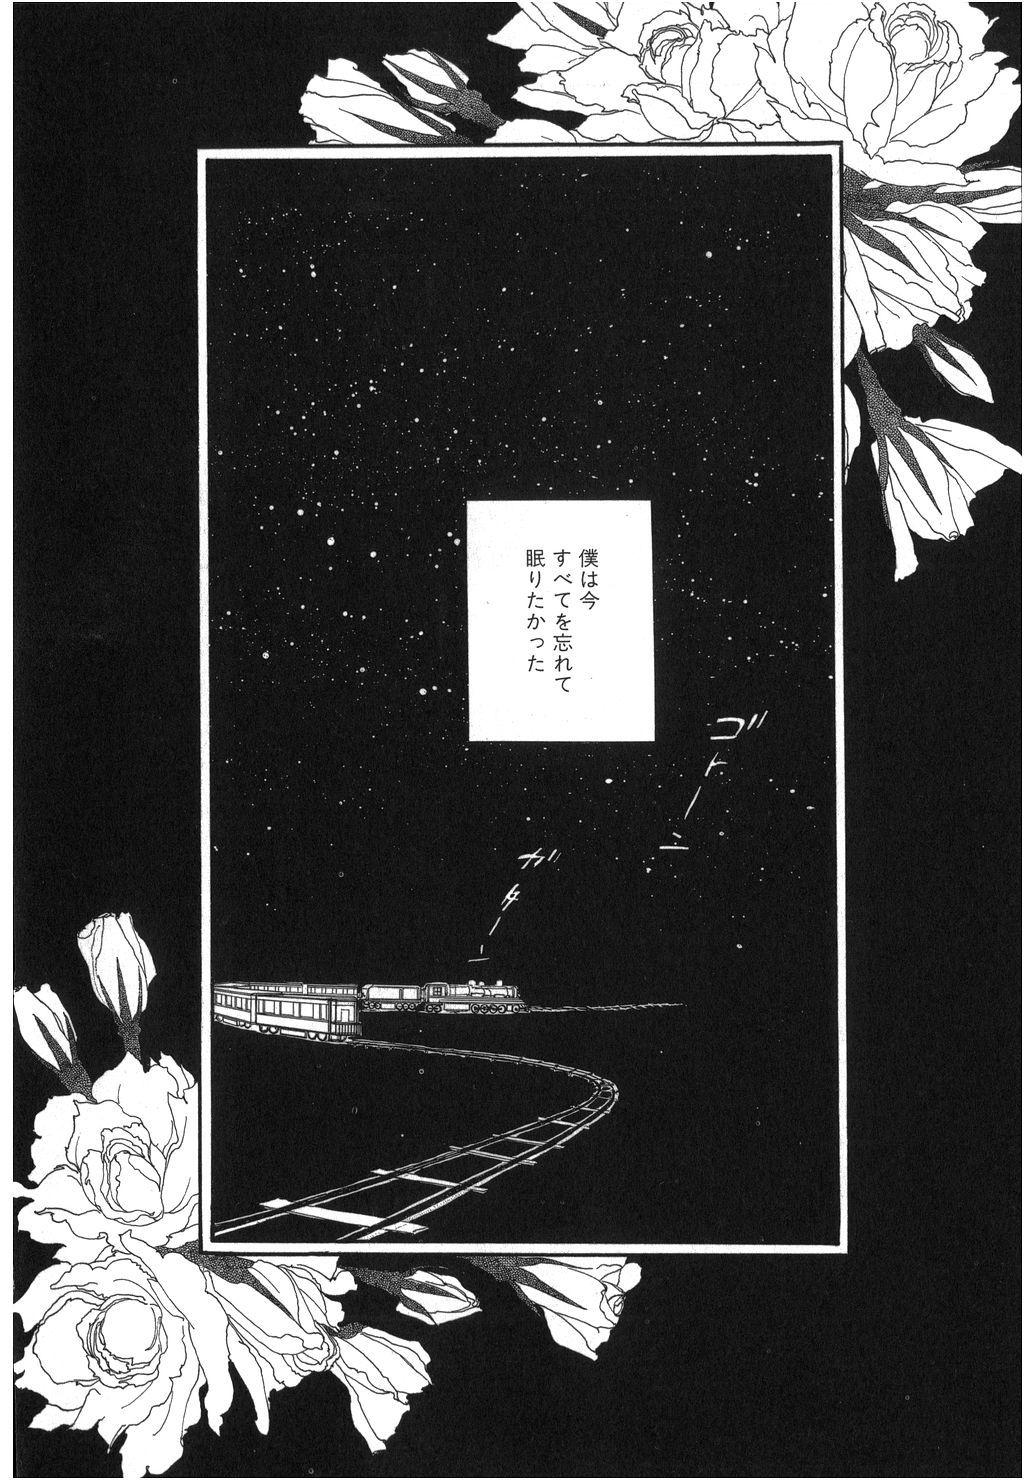 Aesthetic Manga Phone Wallpaper